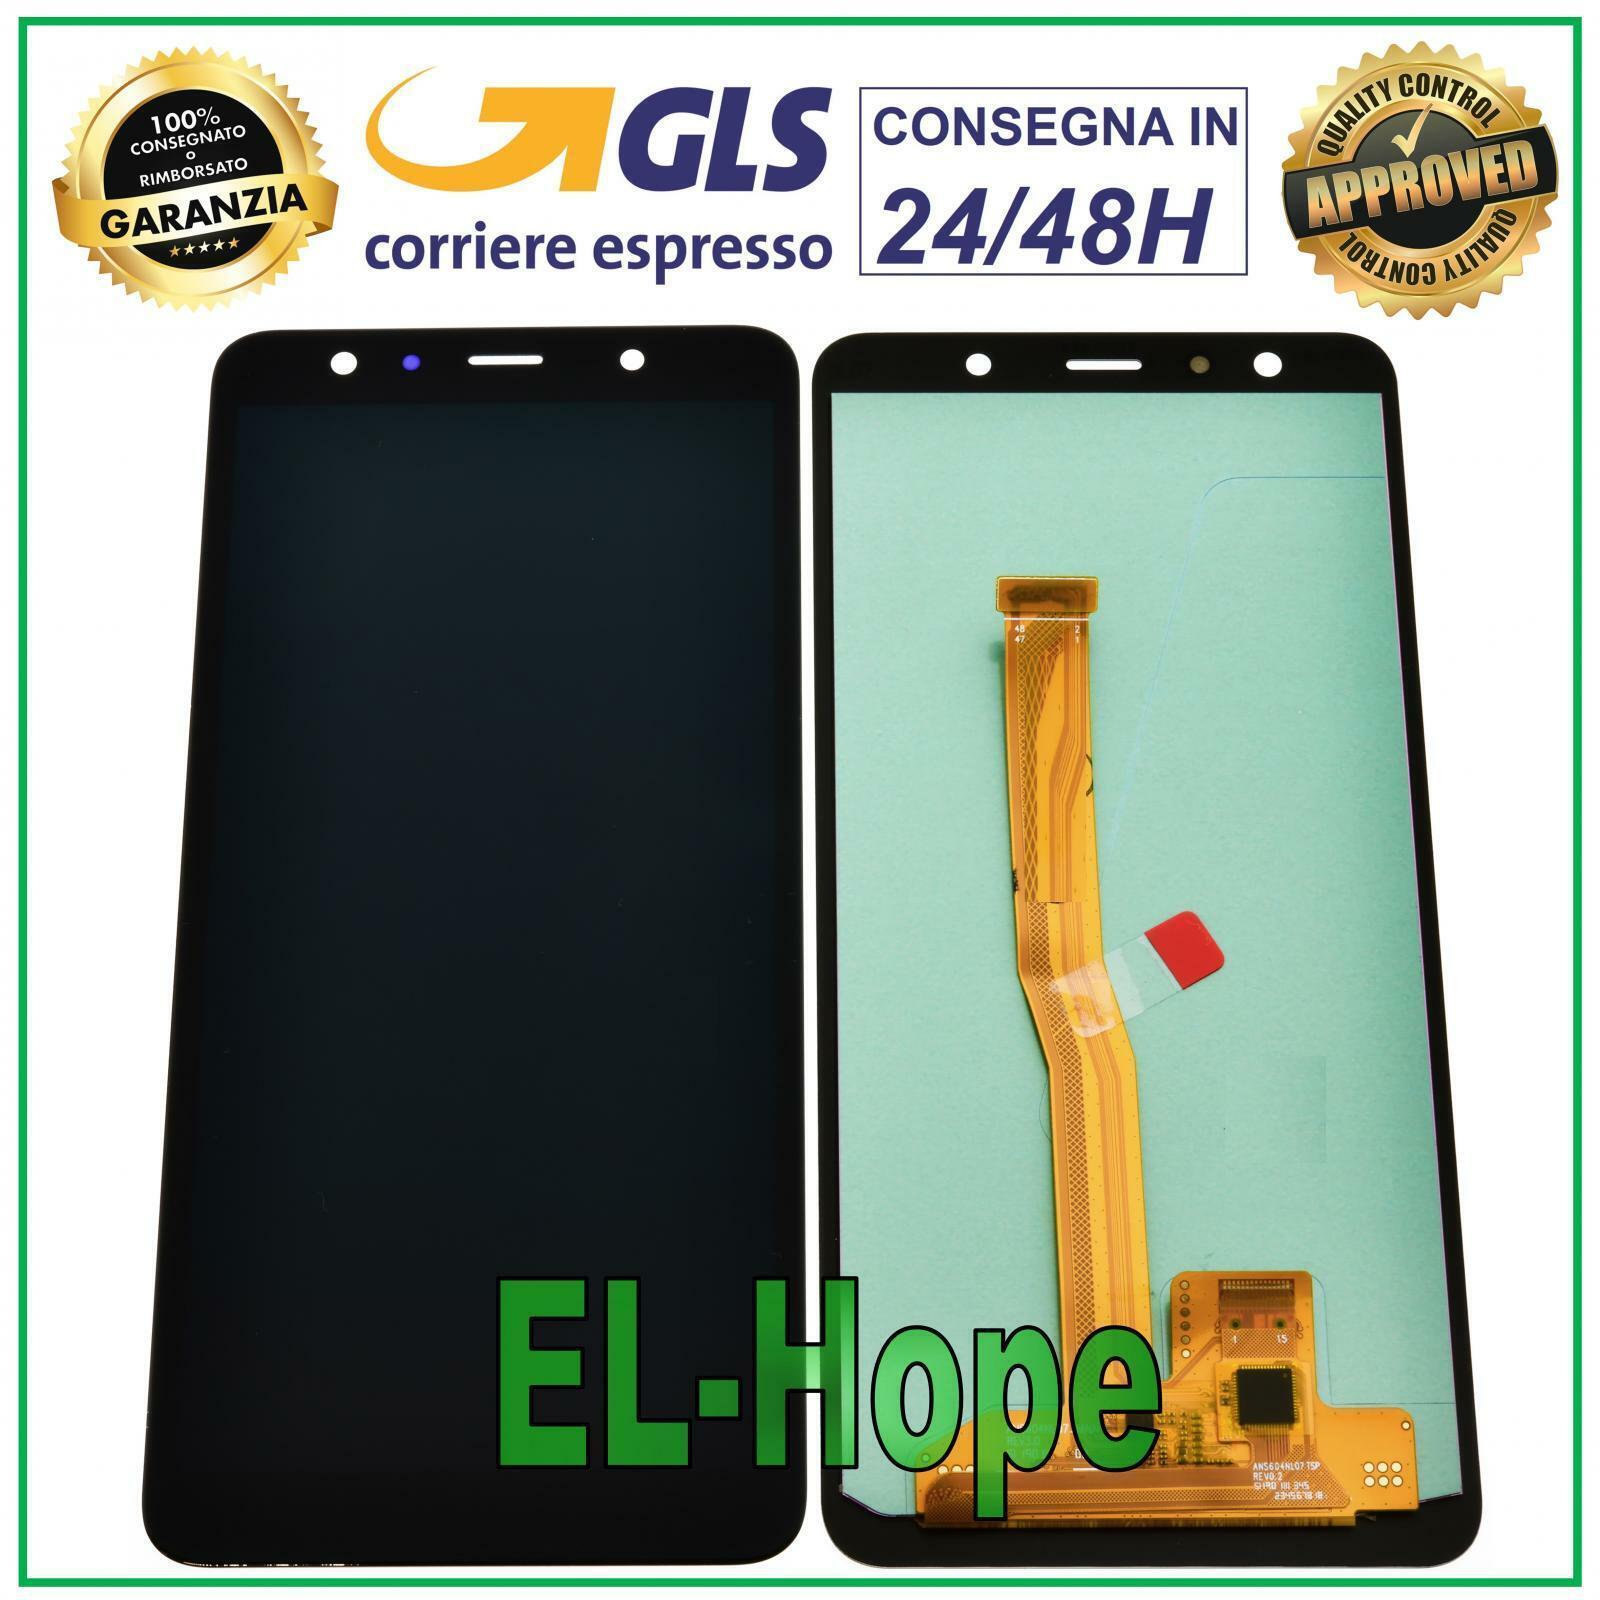 Samsung Galaxy: DISPLAY LCD PER SAMSUNG GALAXY A7 2018 A750F SM-A750F TOUCH SCREEN VETRO NERO